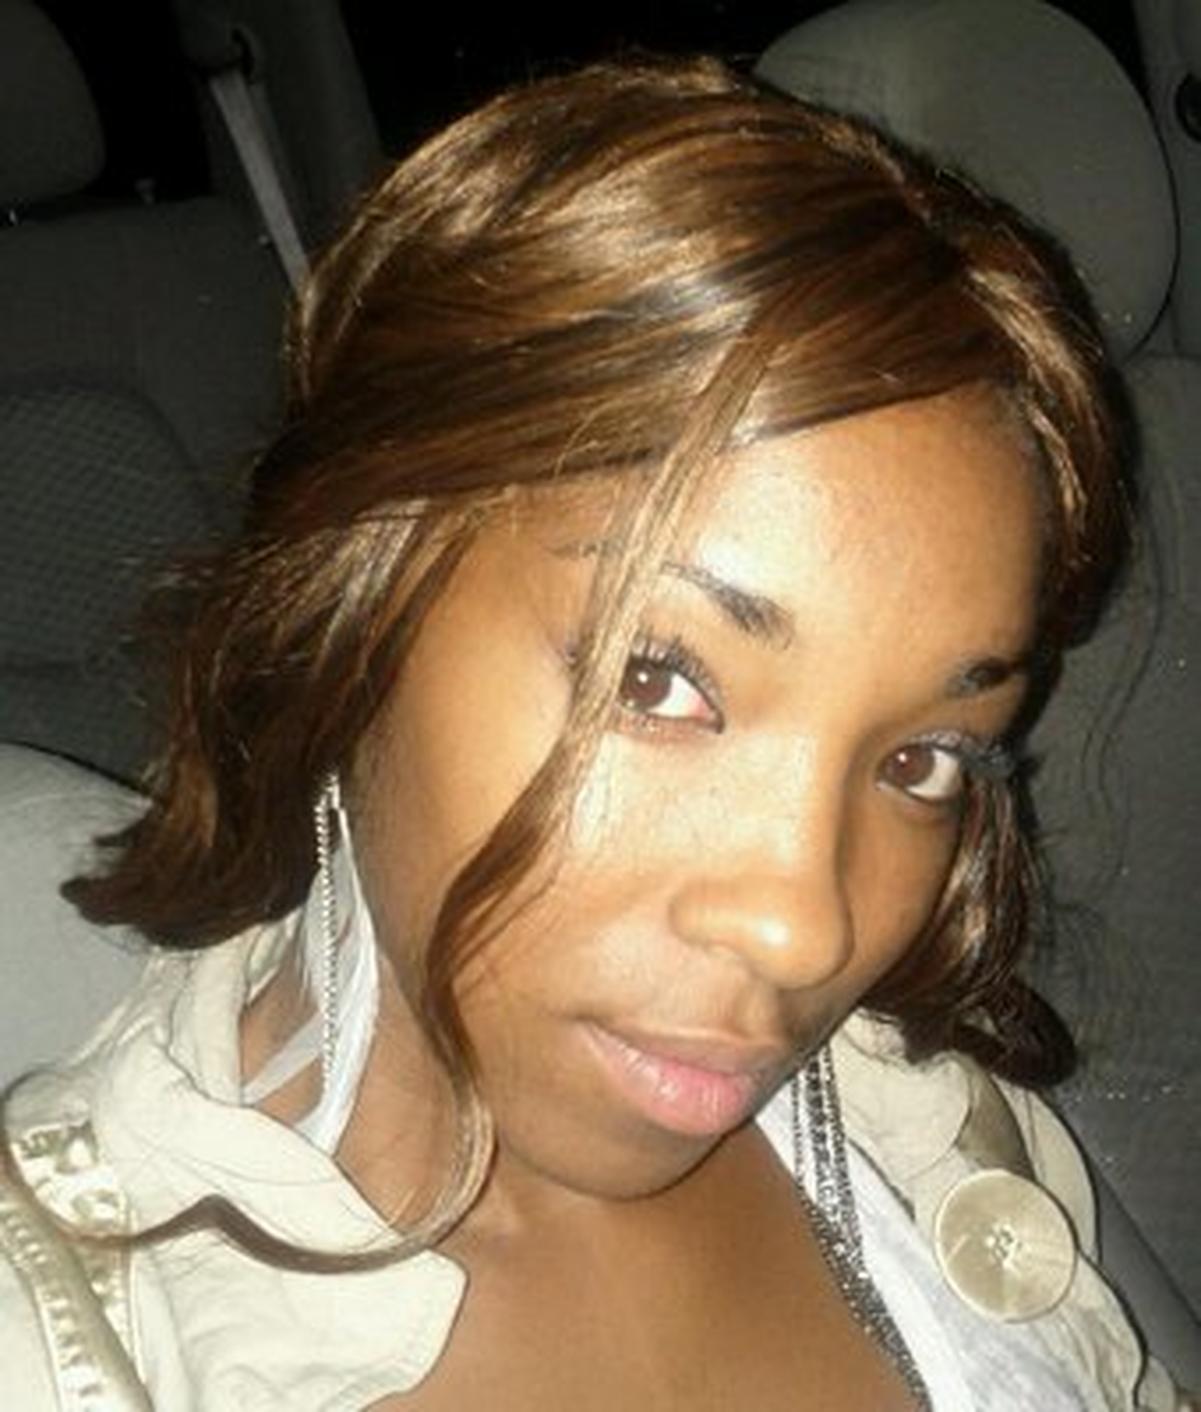 Ms. Beautidoll